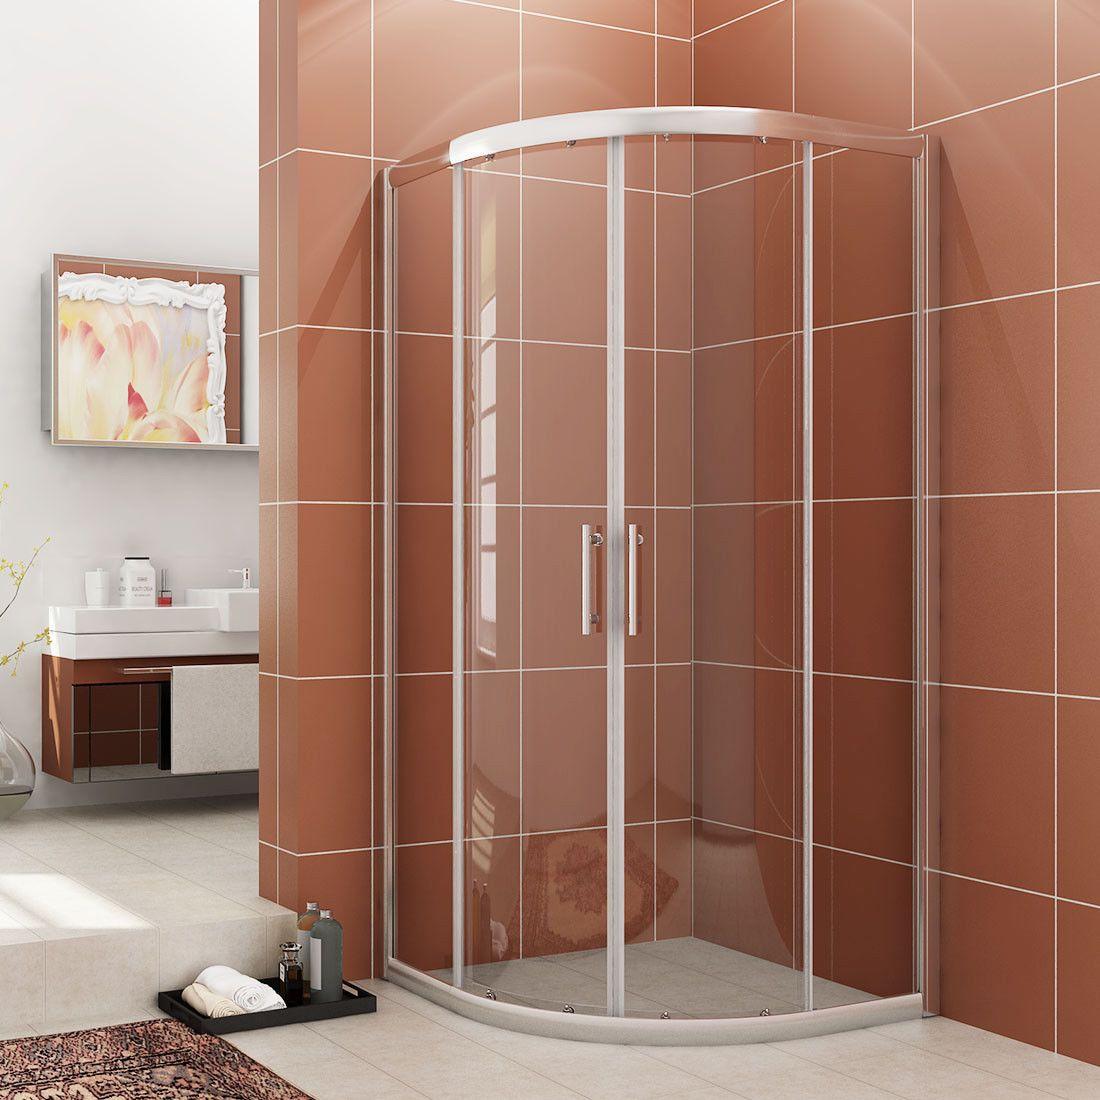 Cool Corner Shower Doors Glass Ideas Corner Shower Doors Shower Doors Corner Shower